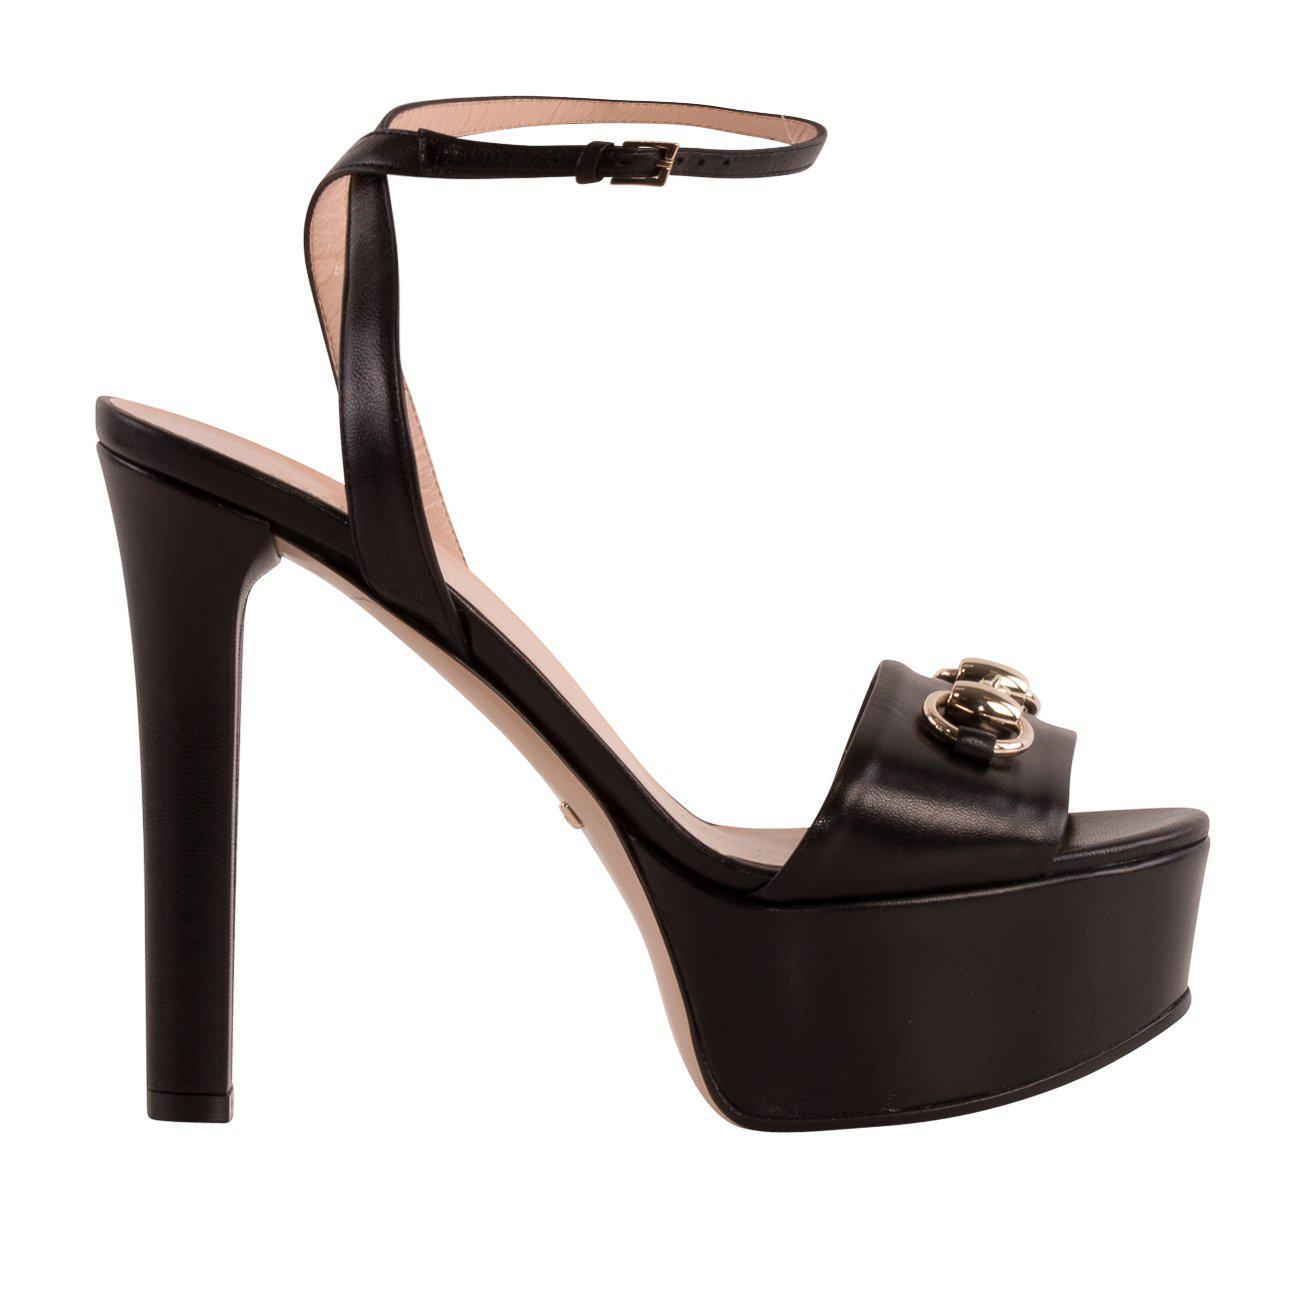 762c28b83ae Gucci Signature Buckle Sandals in Black - Lyst